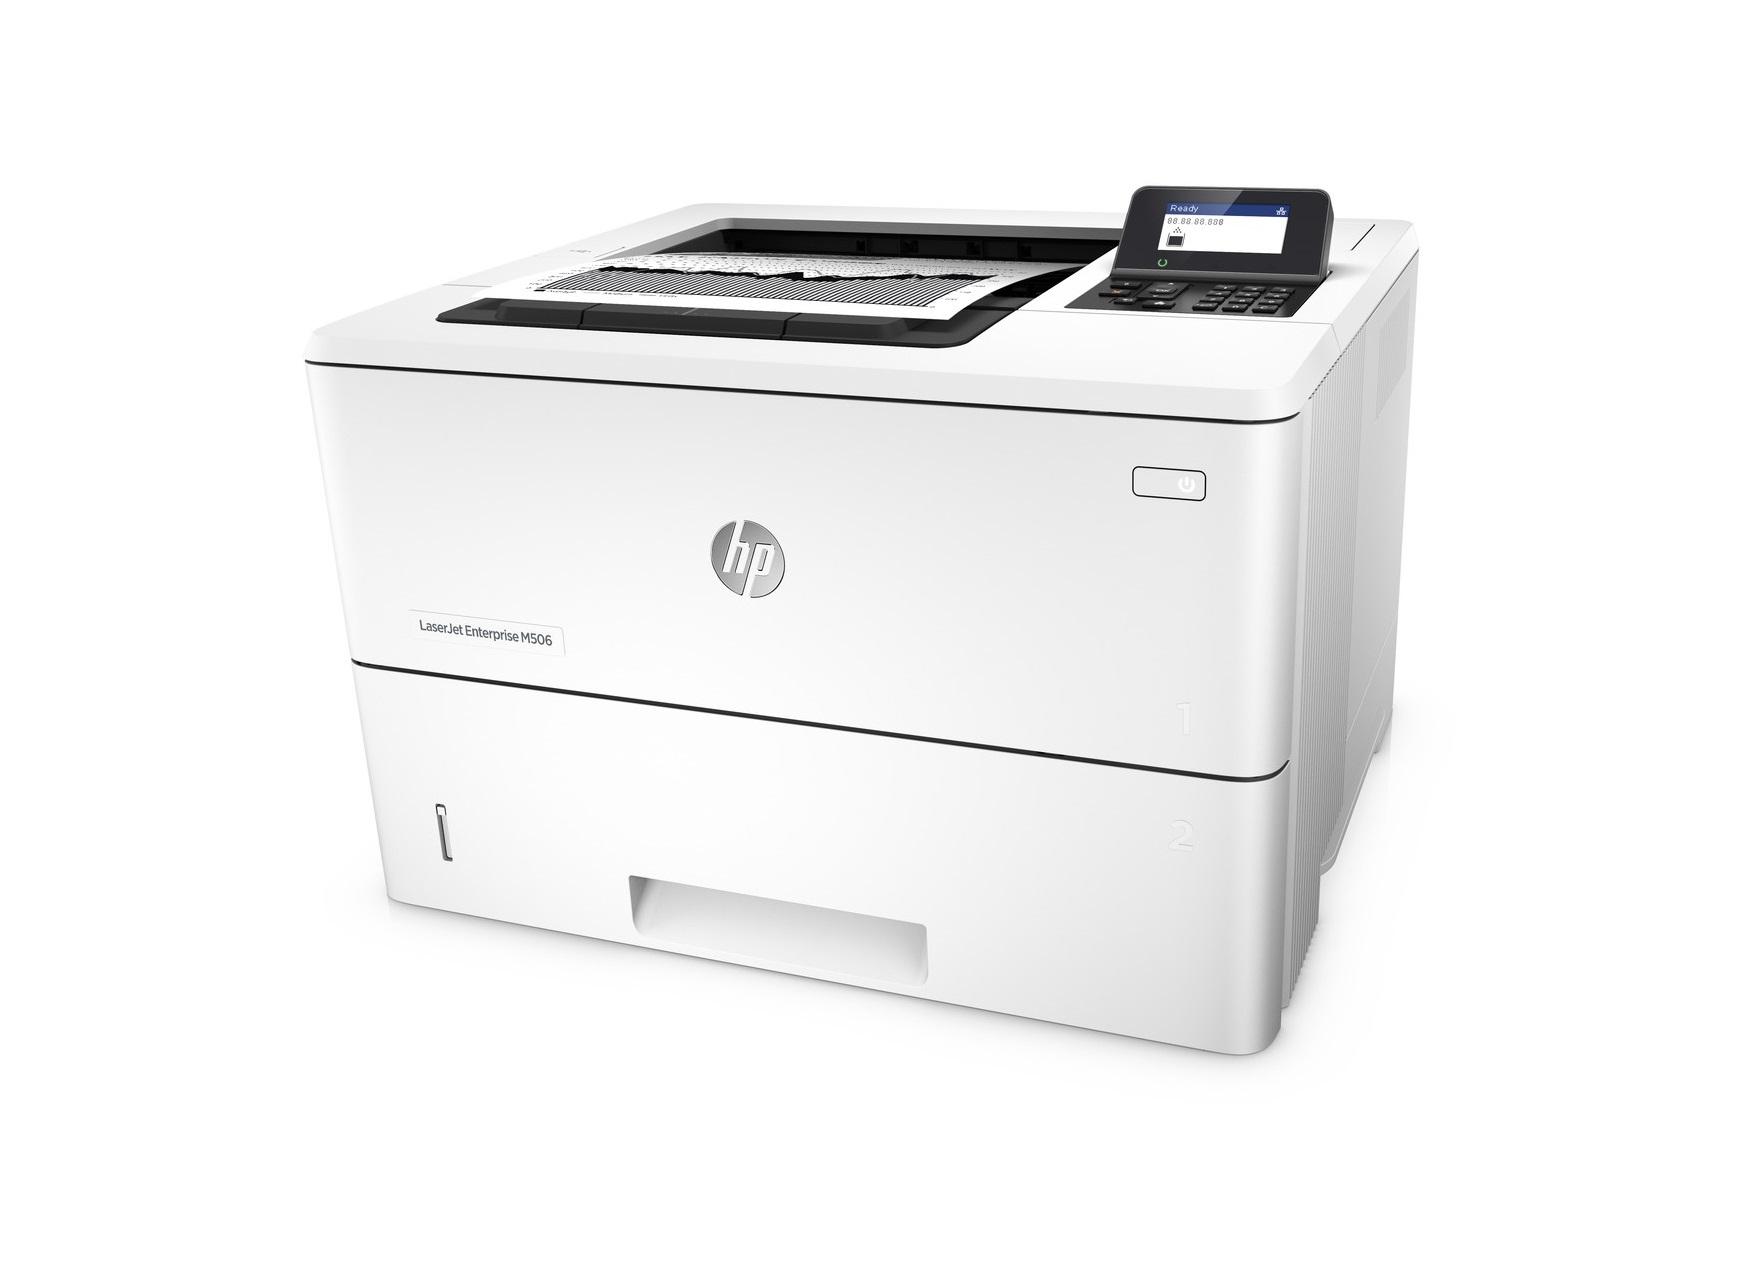 hp laserjet enterprise m506dn printer pavan computers garden city